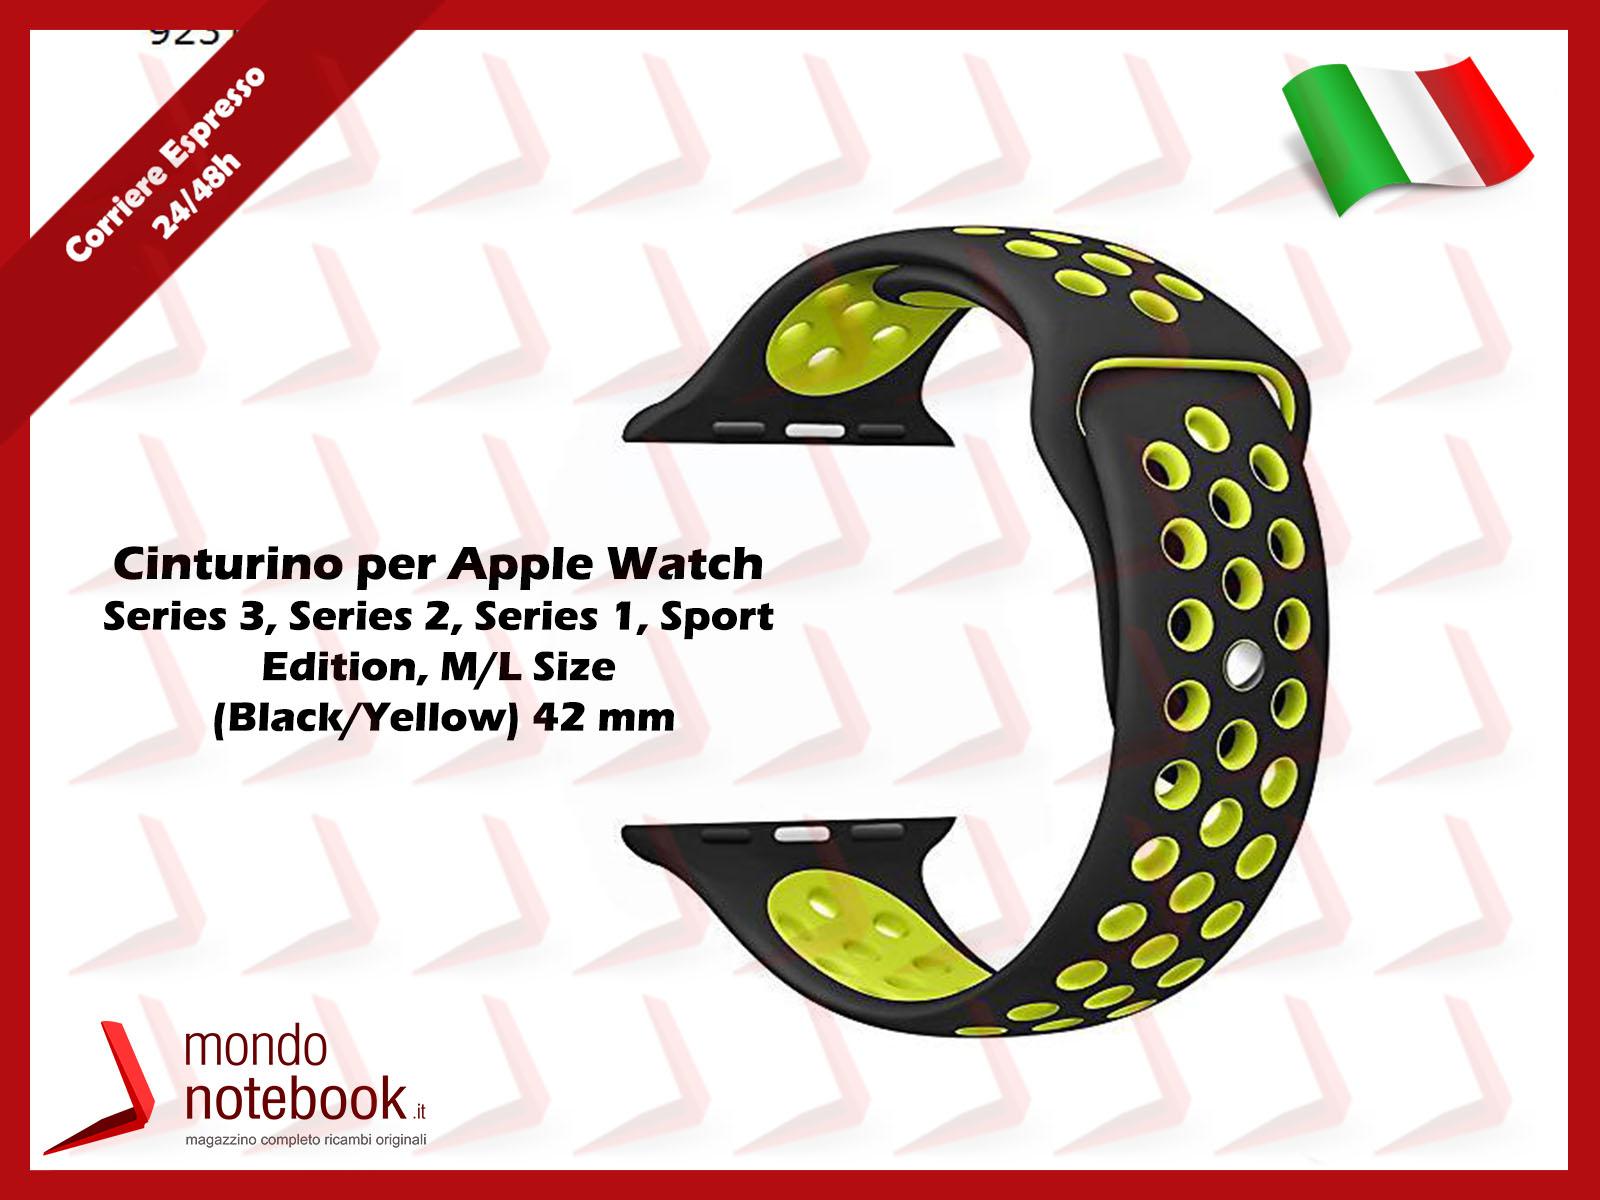 https://www.mondonotebook.it/6649/cinturino-per-apple-watch-series-3-series-2-series-1-sport-edition-m-l-size-black-yellow-42-mm.jpg